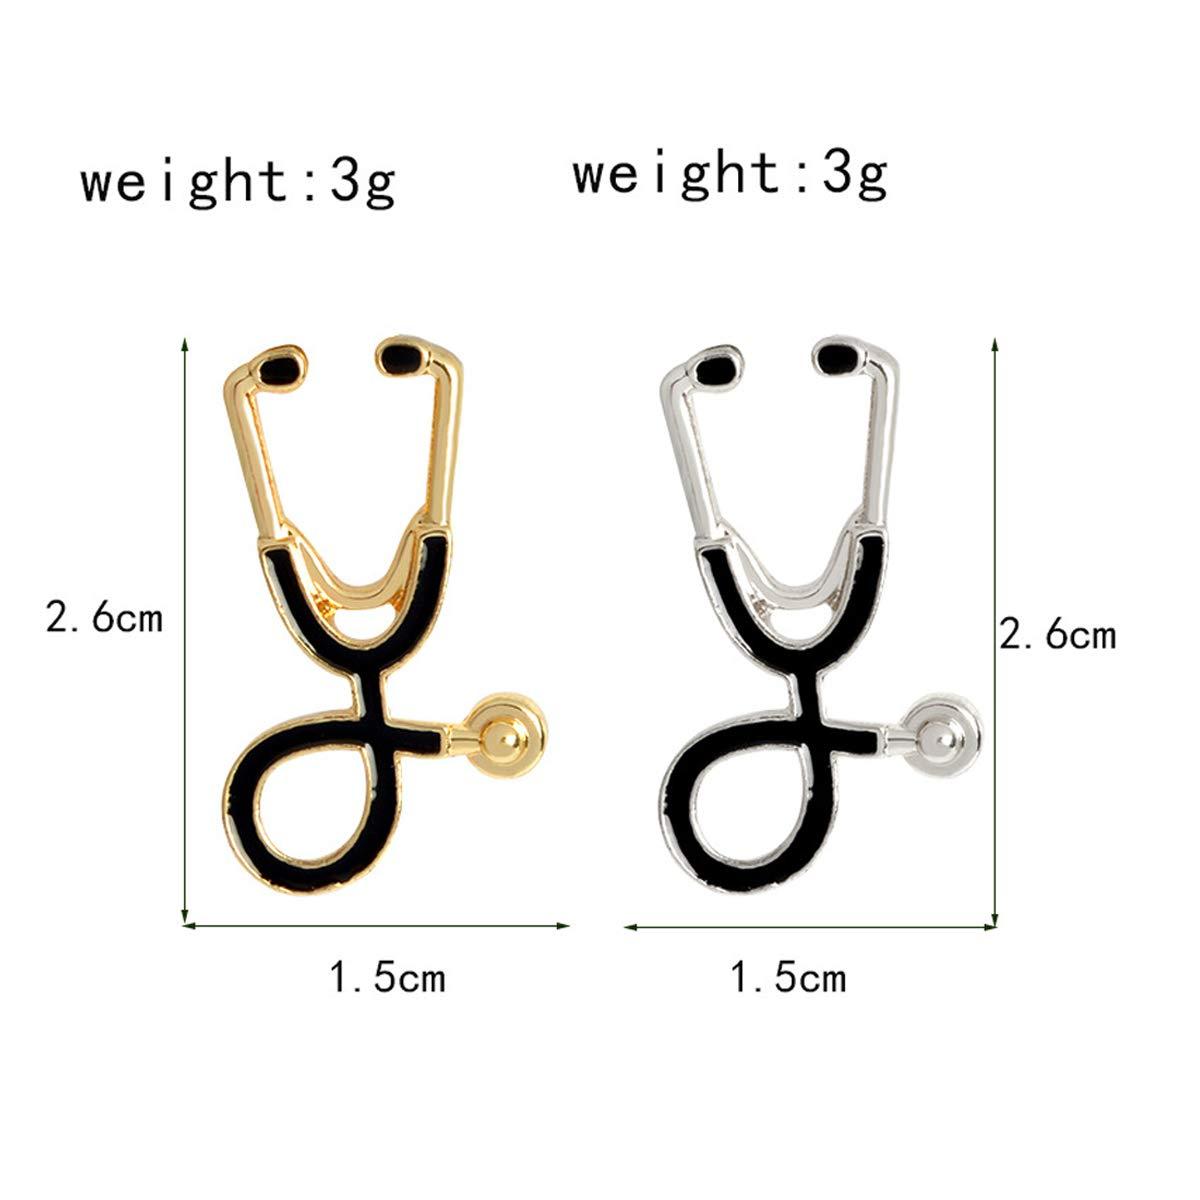 QCQHDU 6PC Medical Doctor Nurse Pins Brooch Enamel Lapel Stethoscope Collar for Doctor Nurse Gift Jewelry